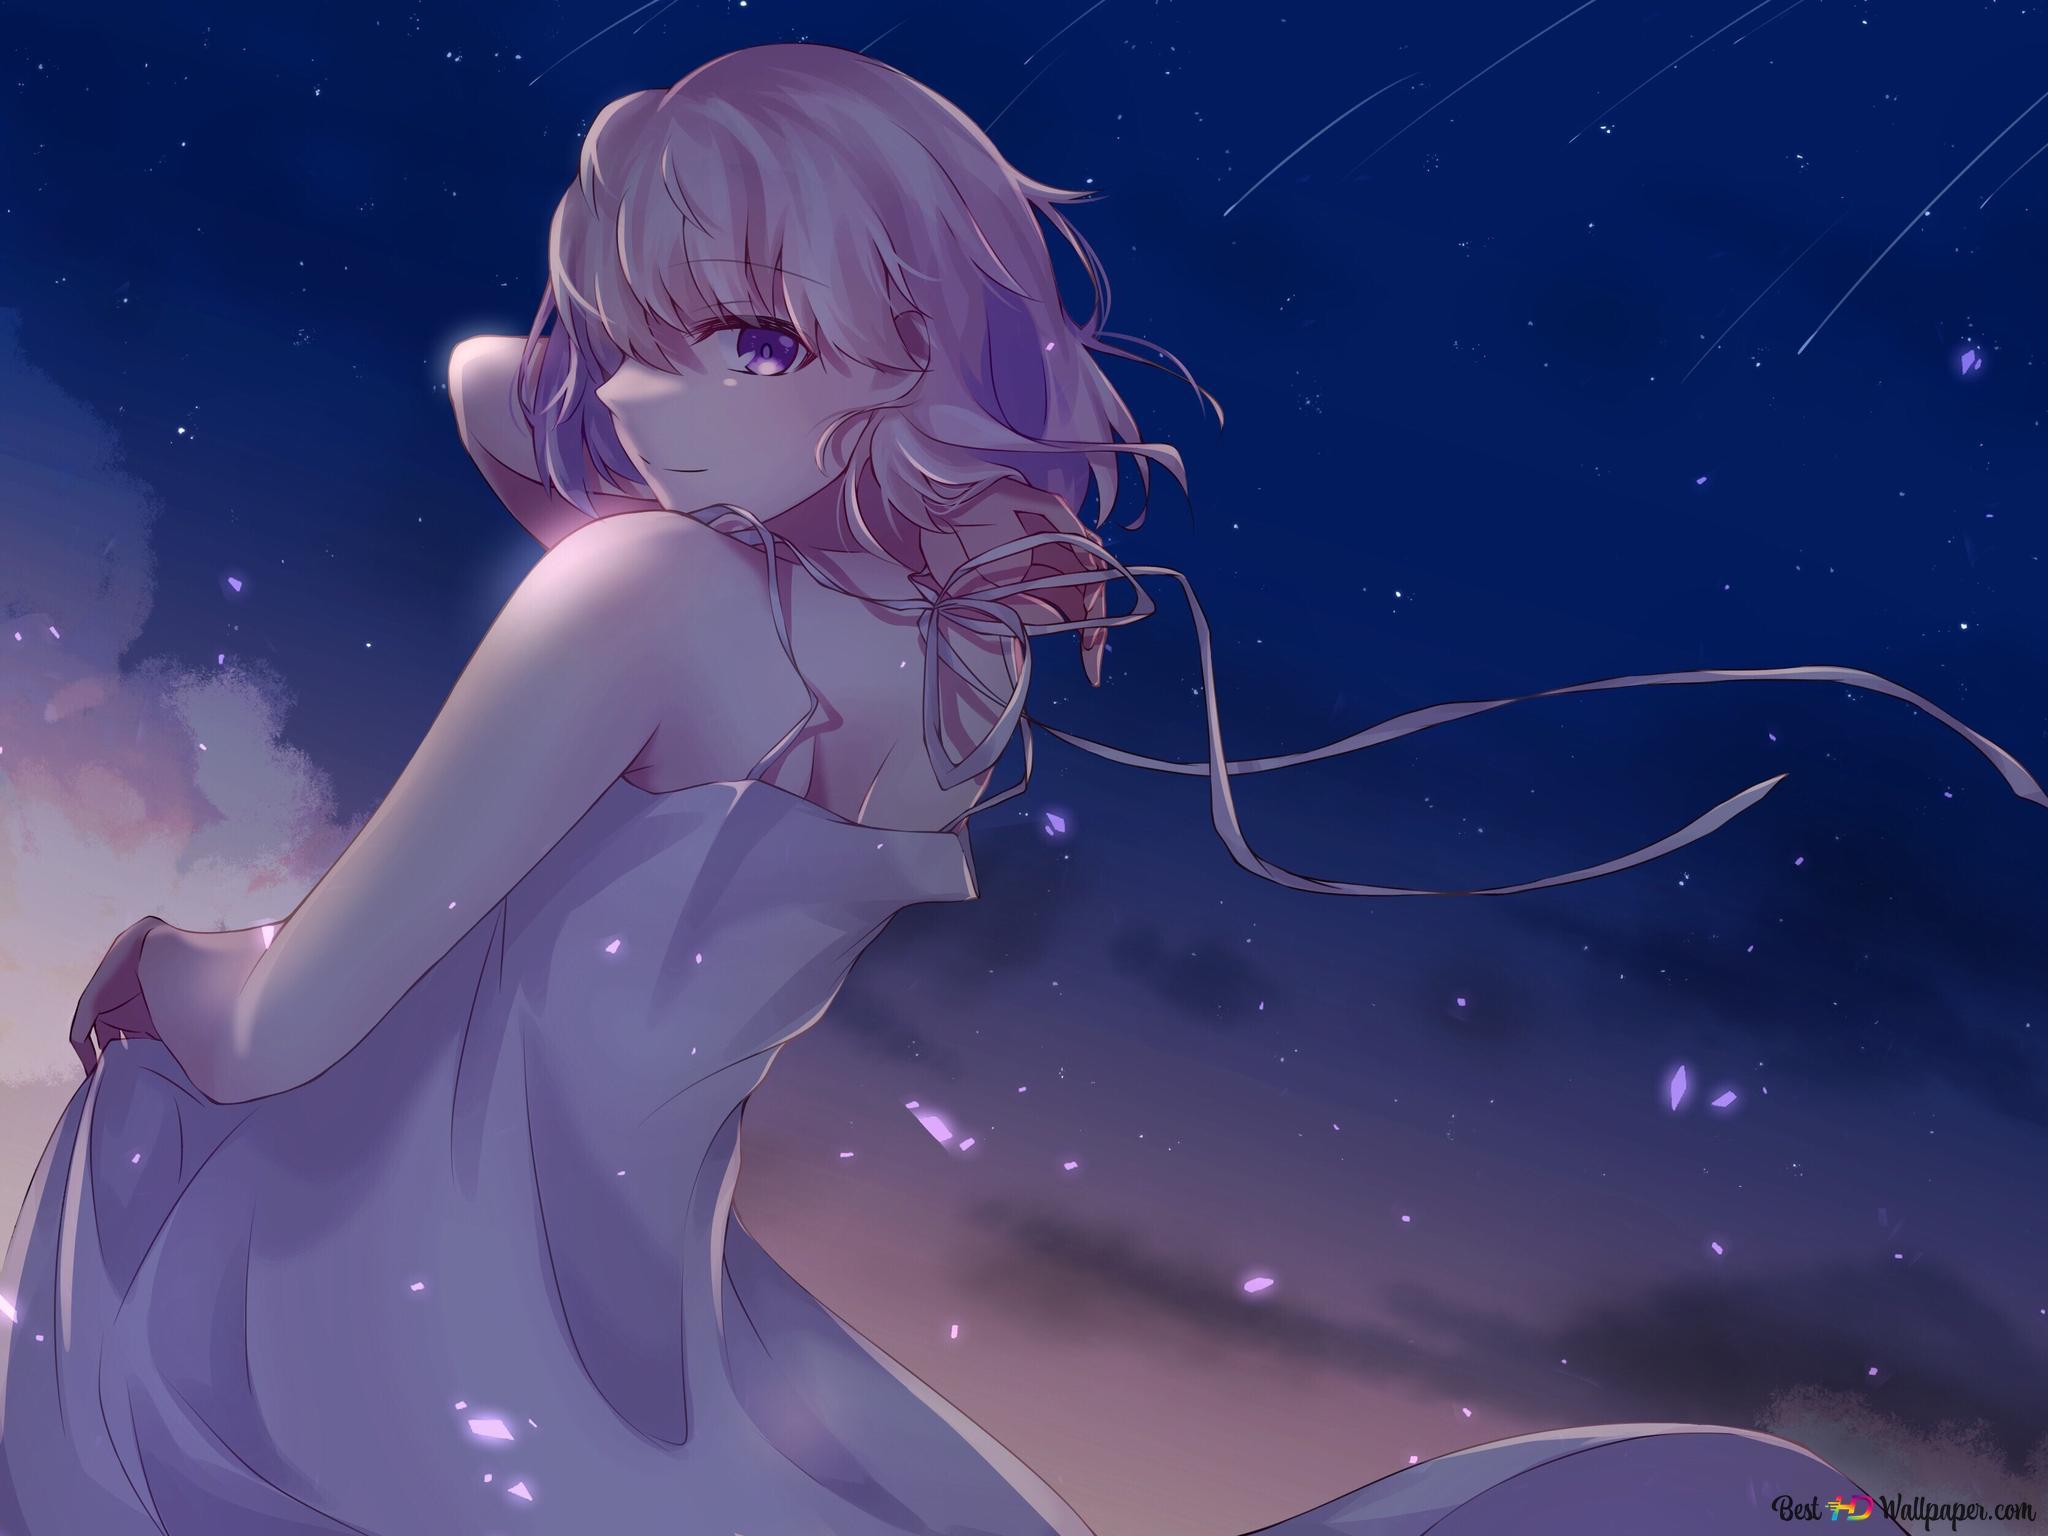 Anime Wallpaper Hd Mashu Fate Grand Order Wallpaper